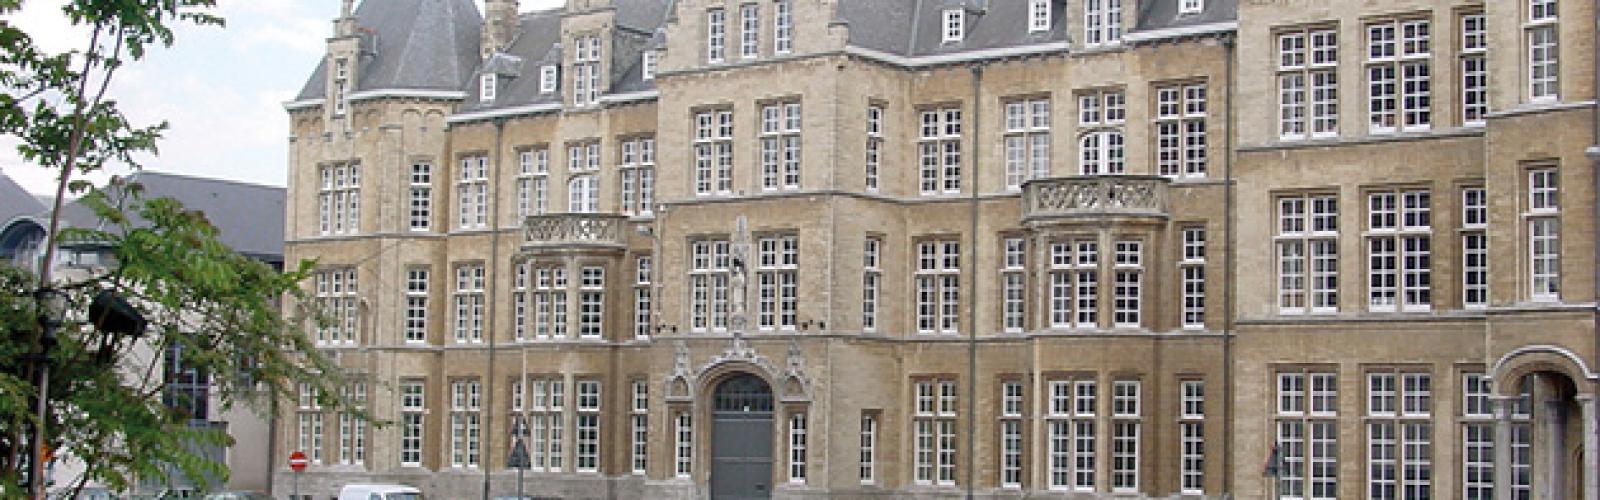 campus Gent Vlerick Business School